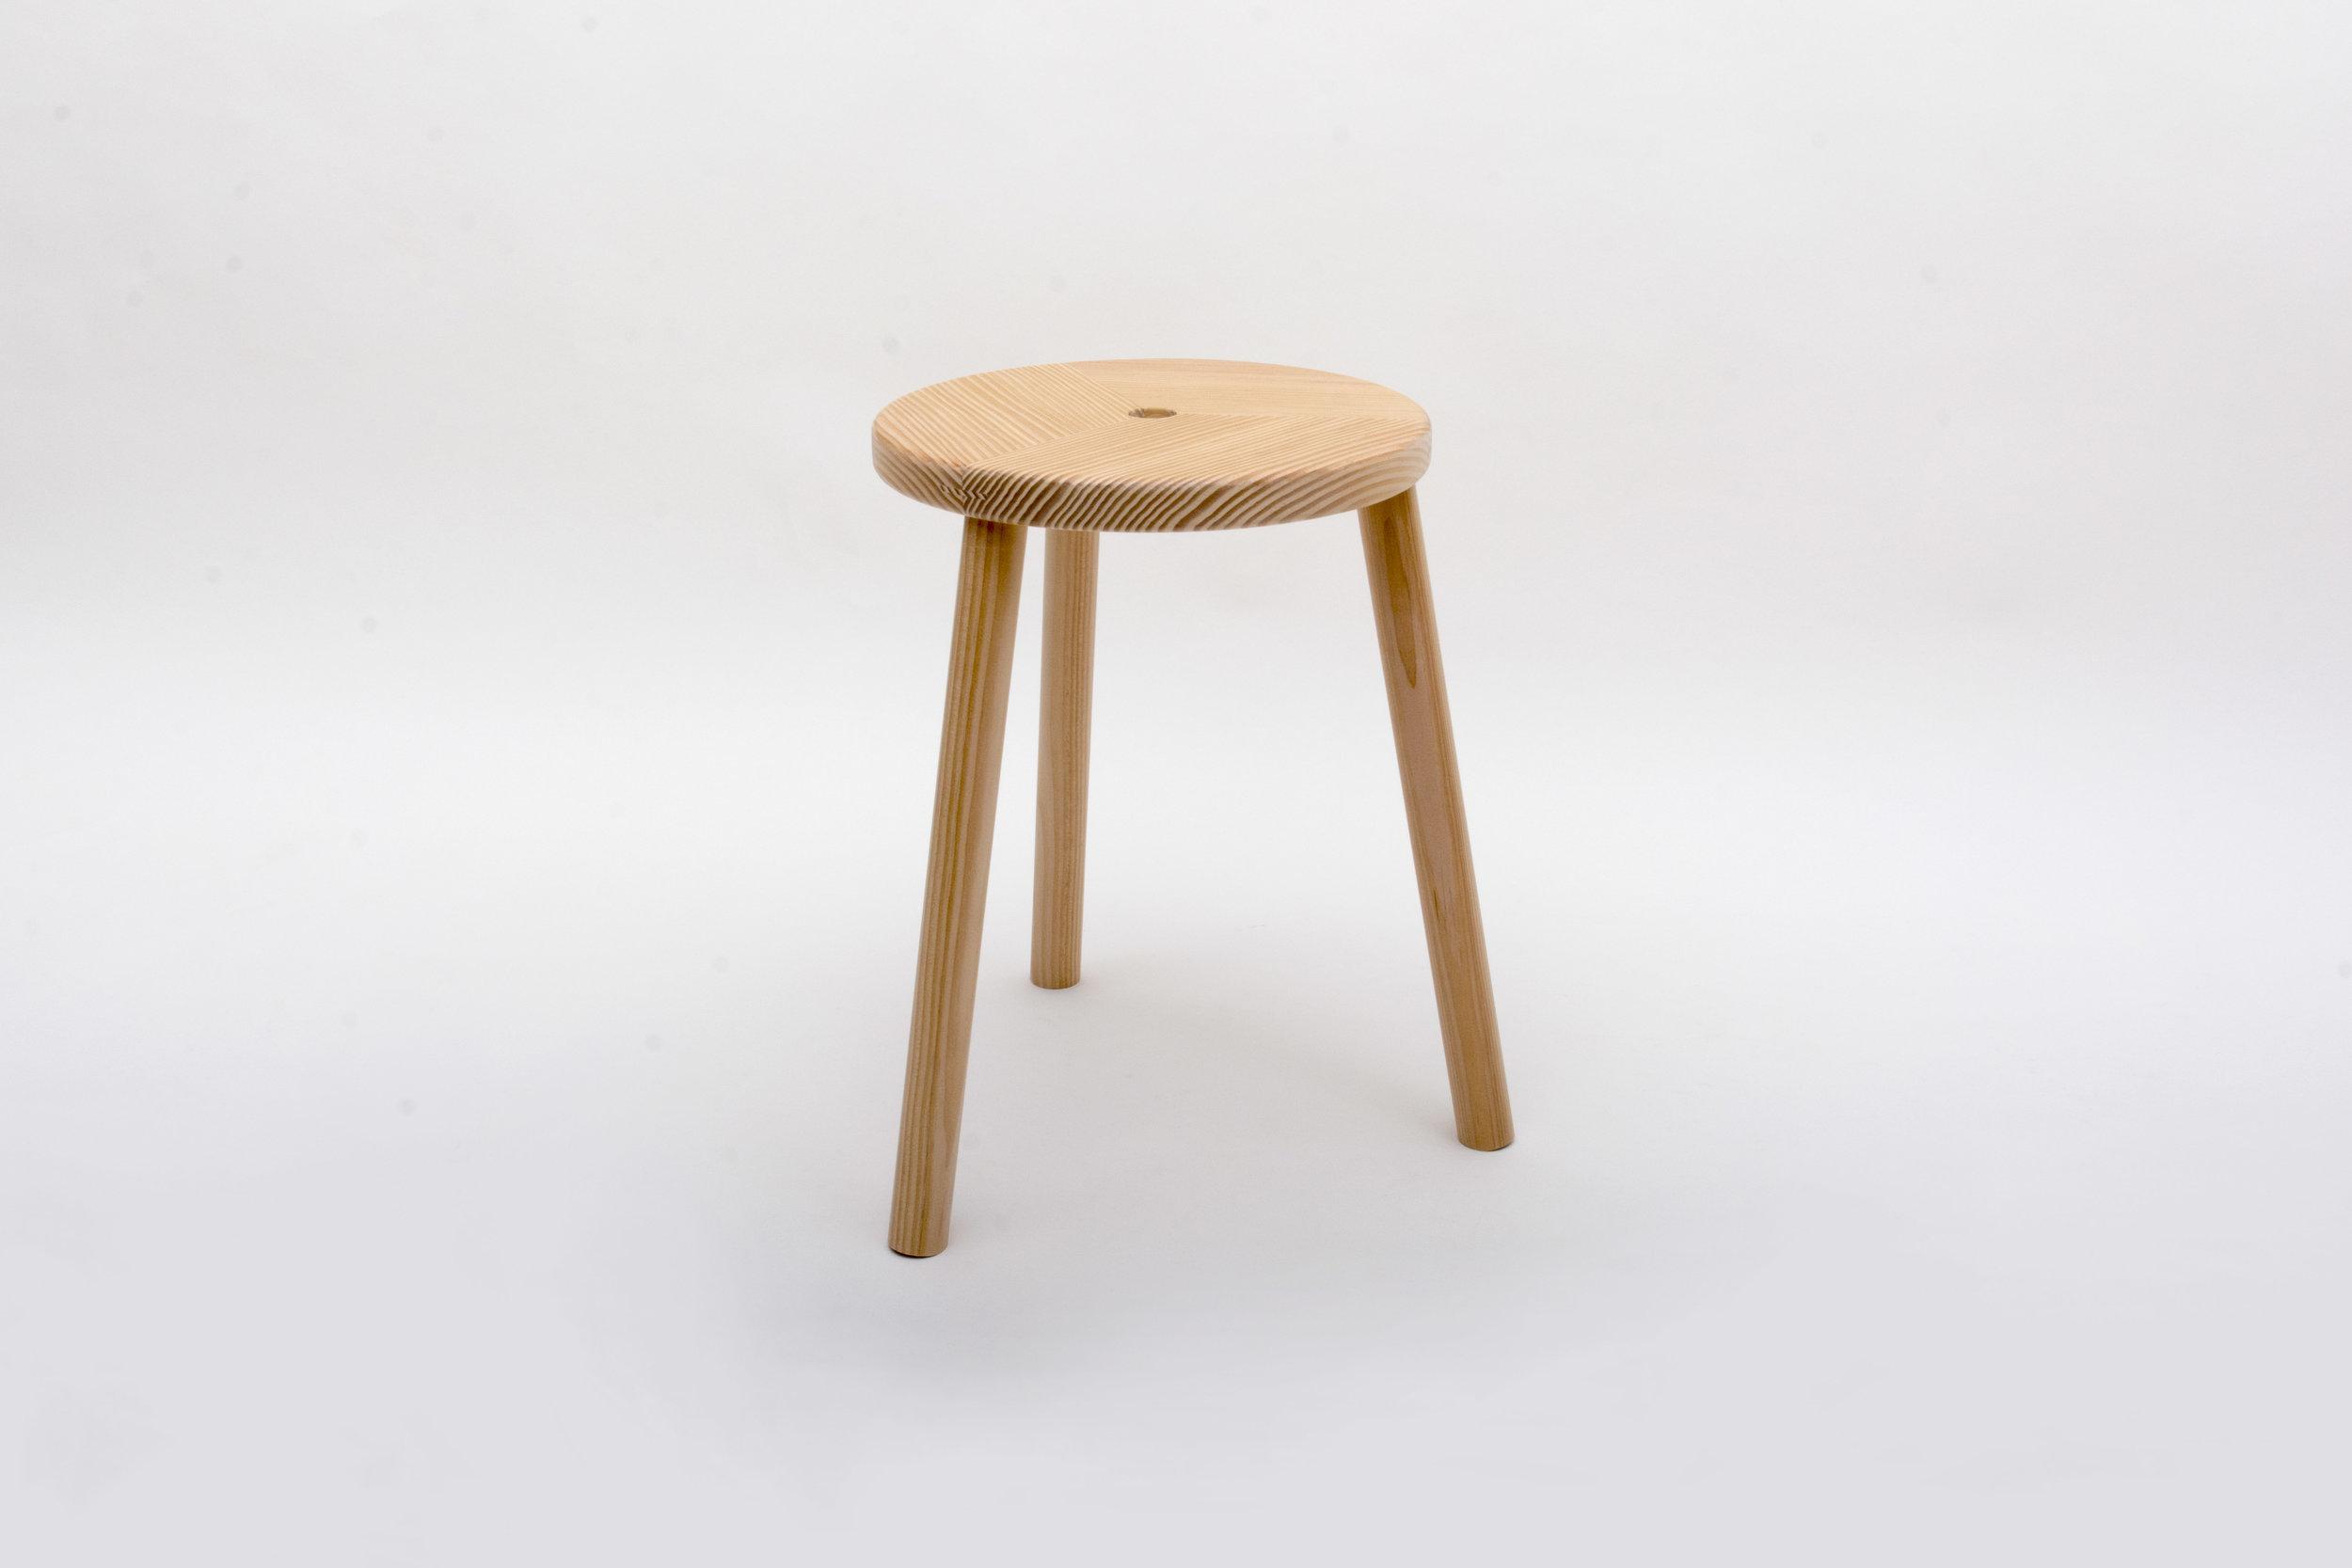 lamp stool bc edition 3.jpg